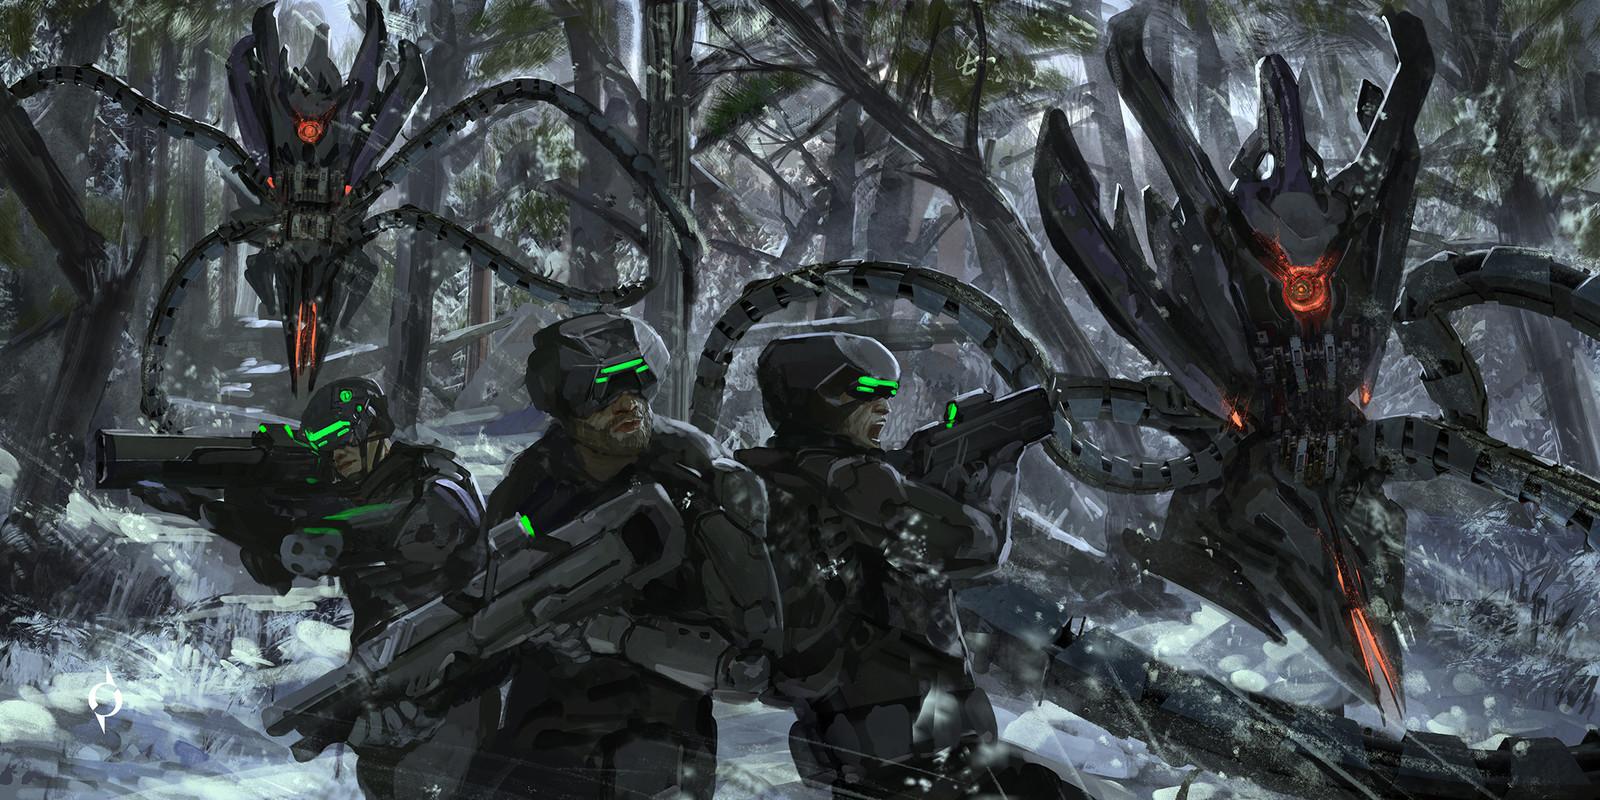 Hunter being hunted